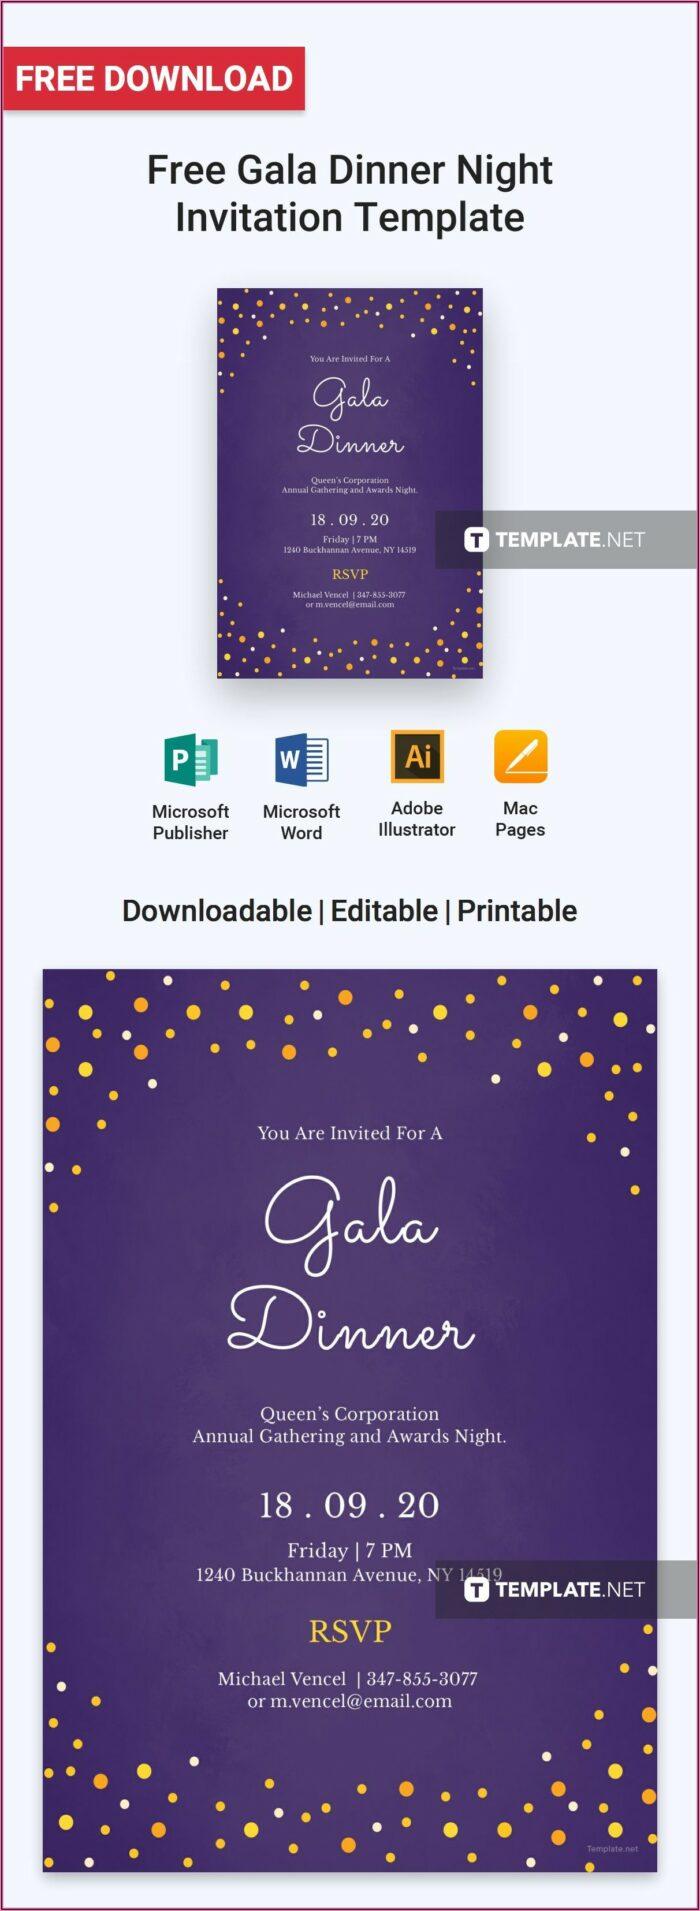 Free Gala Dinner Invitation Template